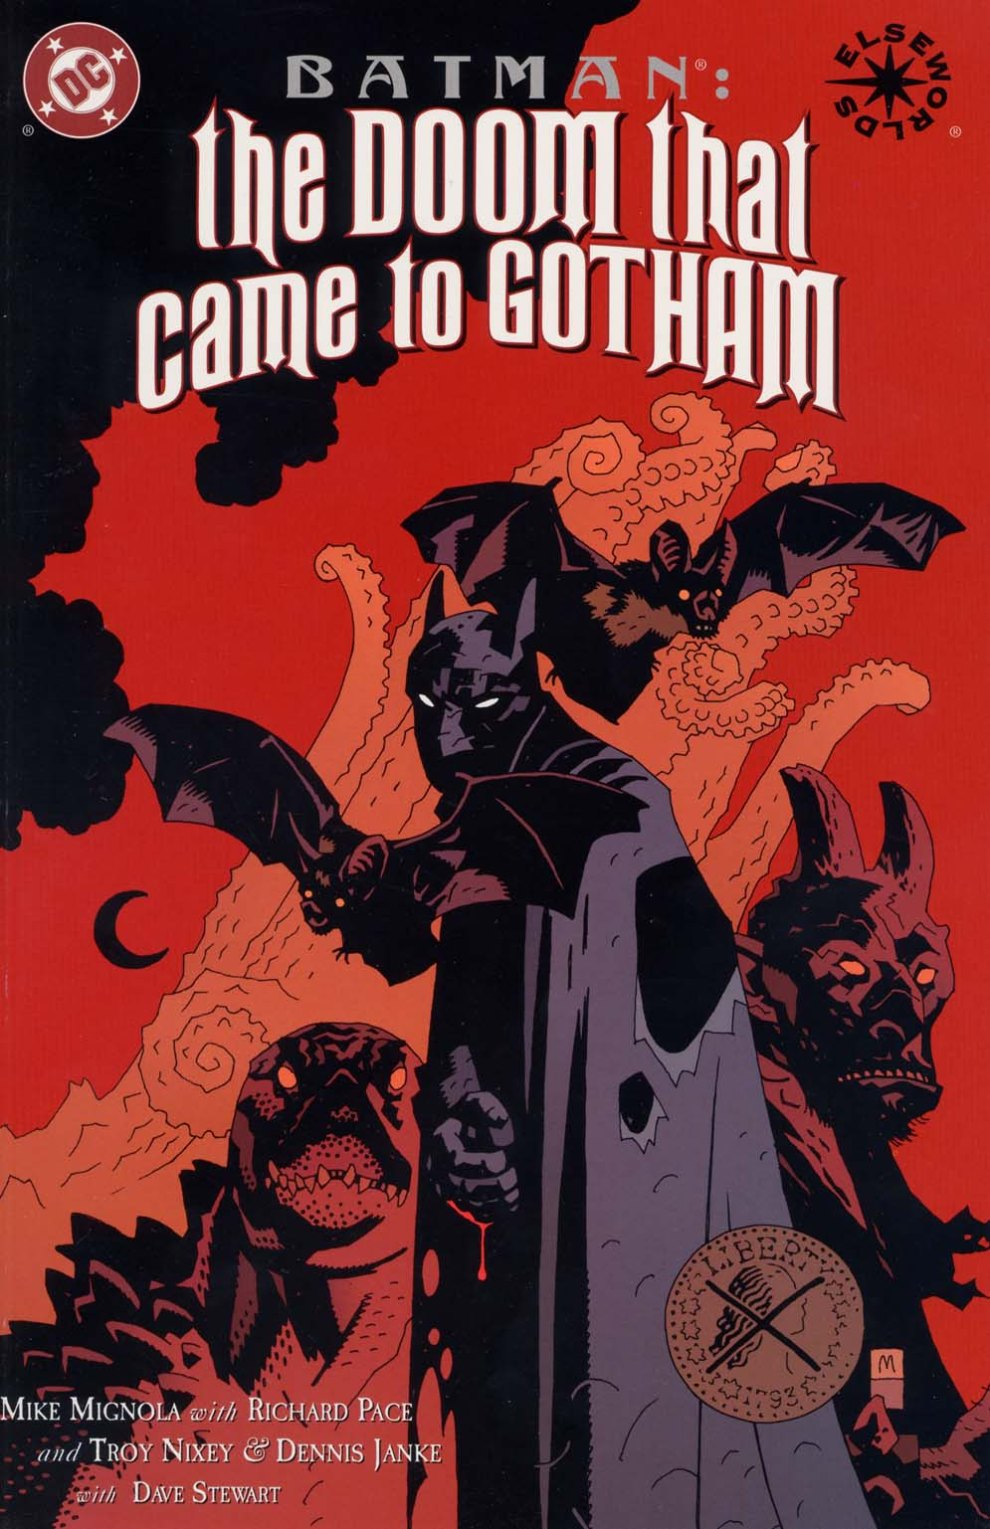 Batman: The Doom That Came To Gotham #3